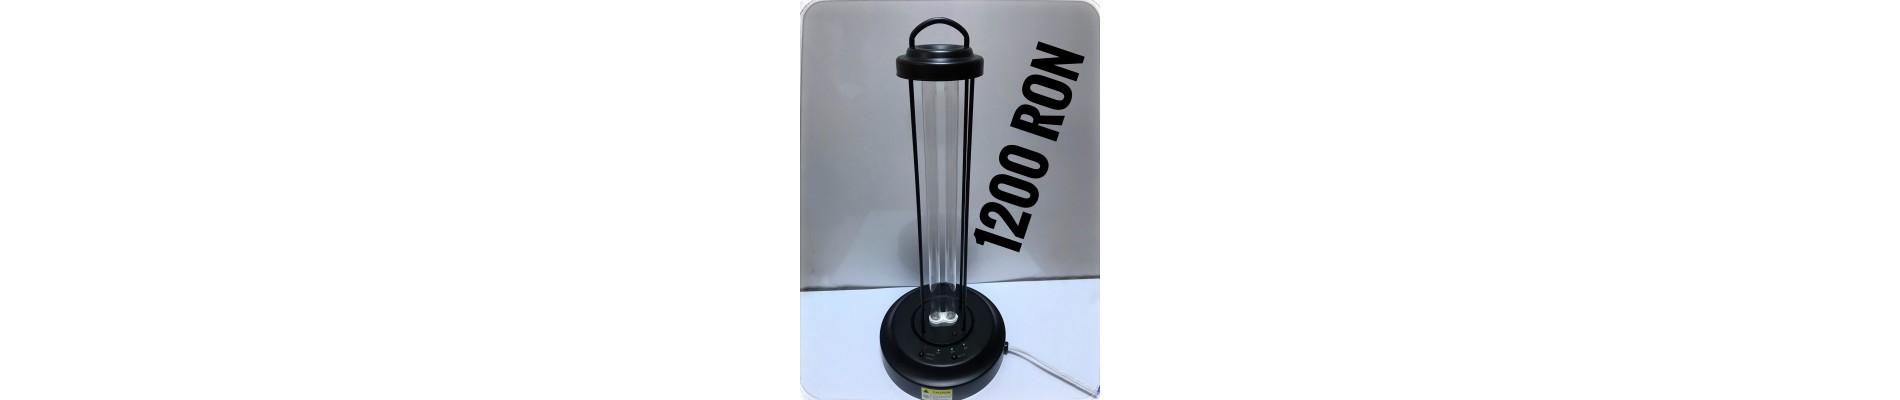 LAMPA PORTABILA 38 W